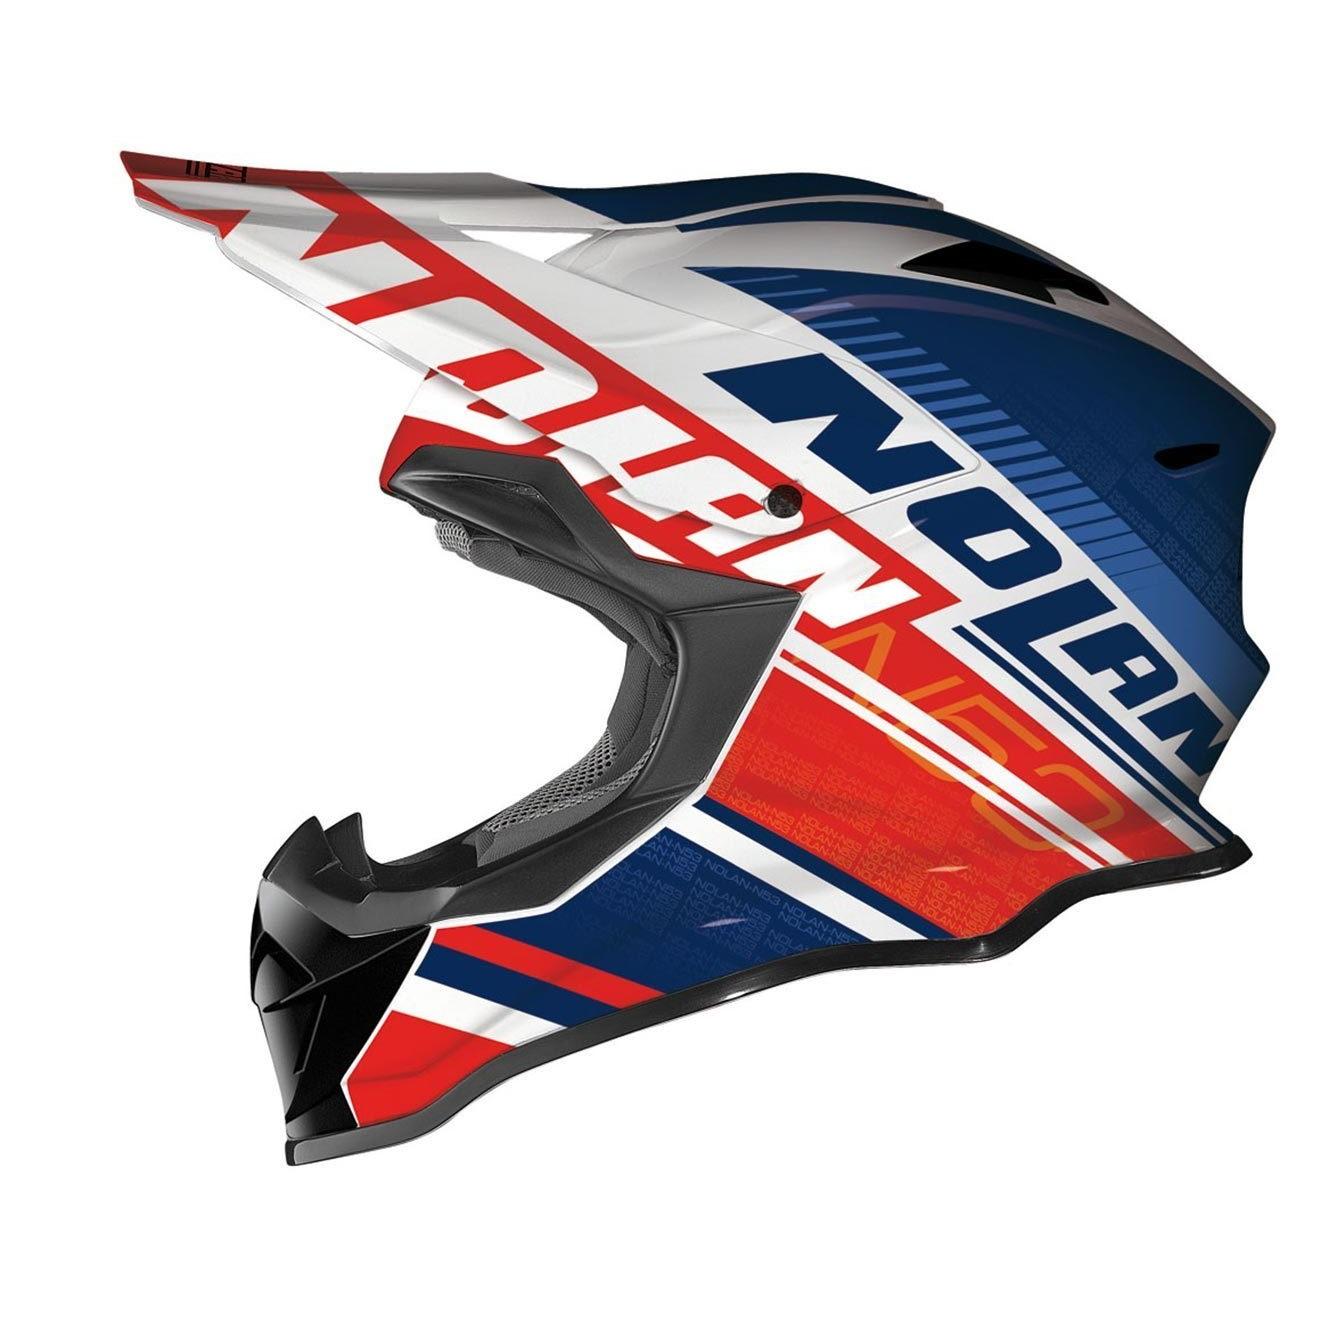 Nolan-N53-Flaxy-Cross-Helmet-0001